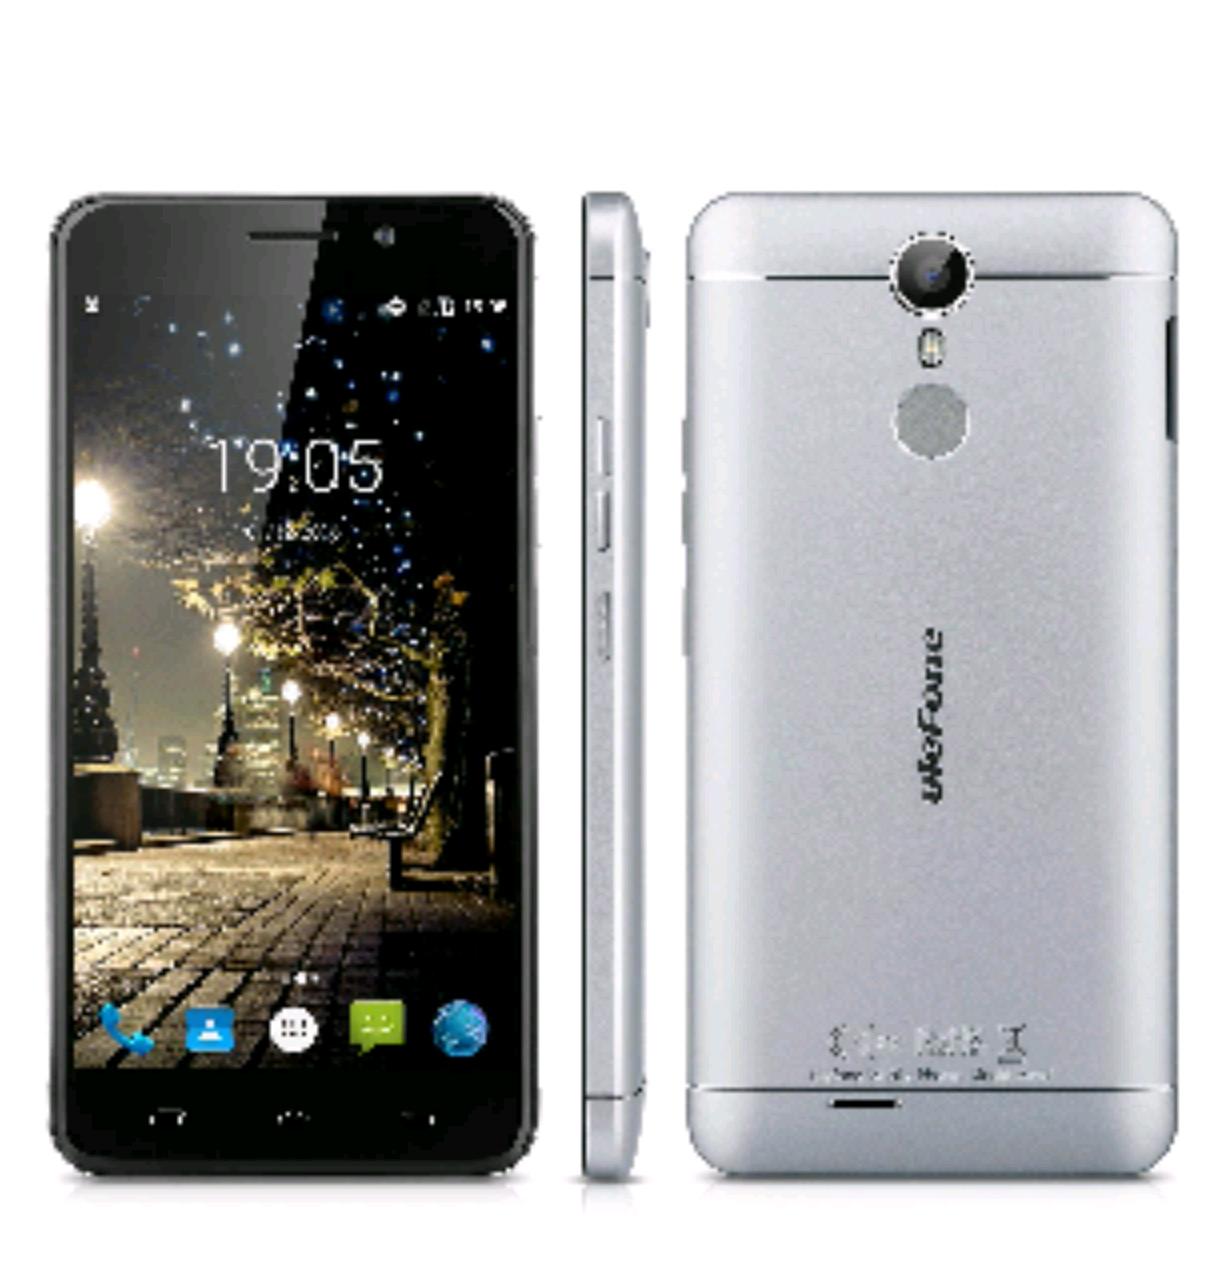 Ulefone Metal 5.0 Zoll 4G-LTE-Smartphone Android 6.0 Octa Core Dual SIM Handy ohne Vertrag 3GB RAM+16GB ROM 8.0MP + 2.0MP Front Dual Kamera Smart Wake Touch ID 3050mAh